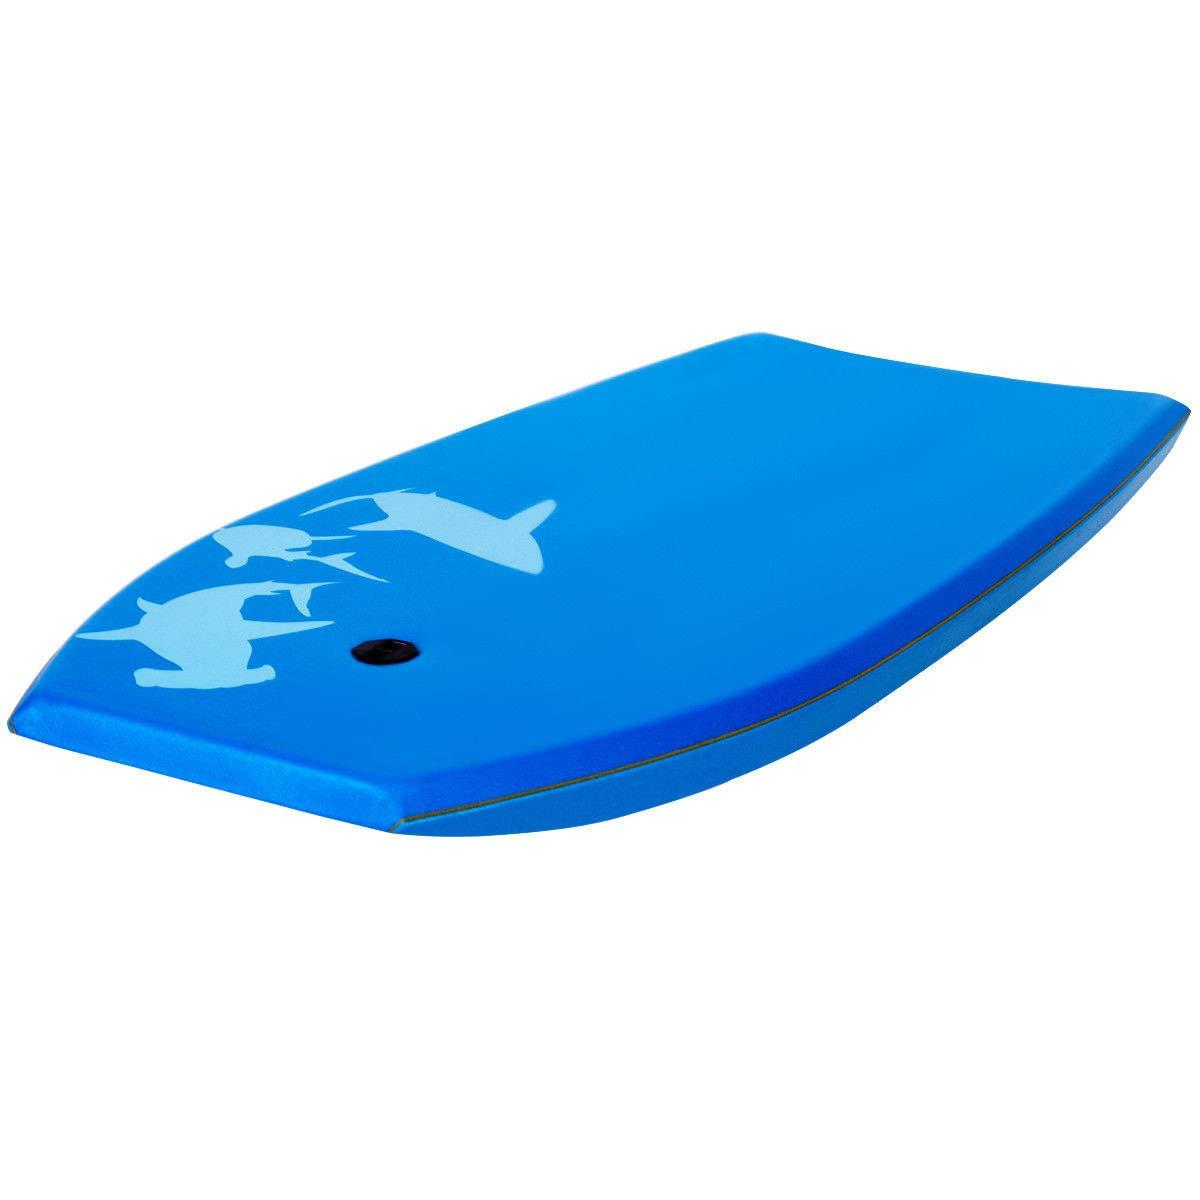 oldzon Bodyboard Surfing 41'' Lightweight Super w/Leash EPS Core Boarding Blue with Ebook